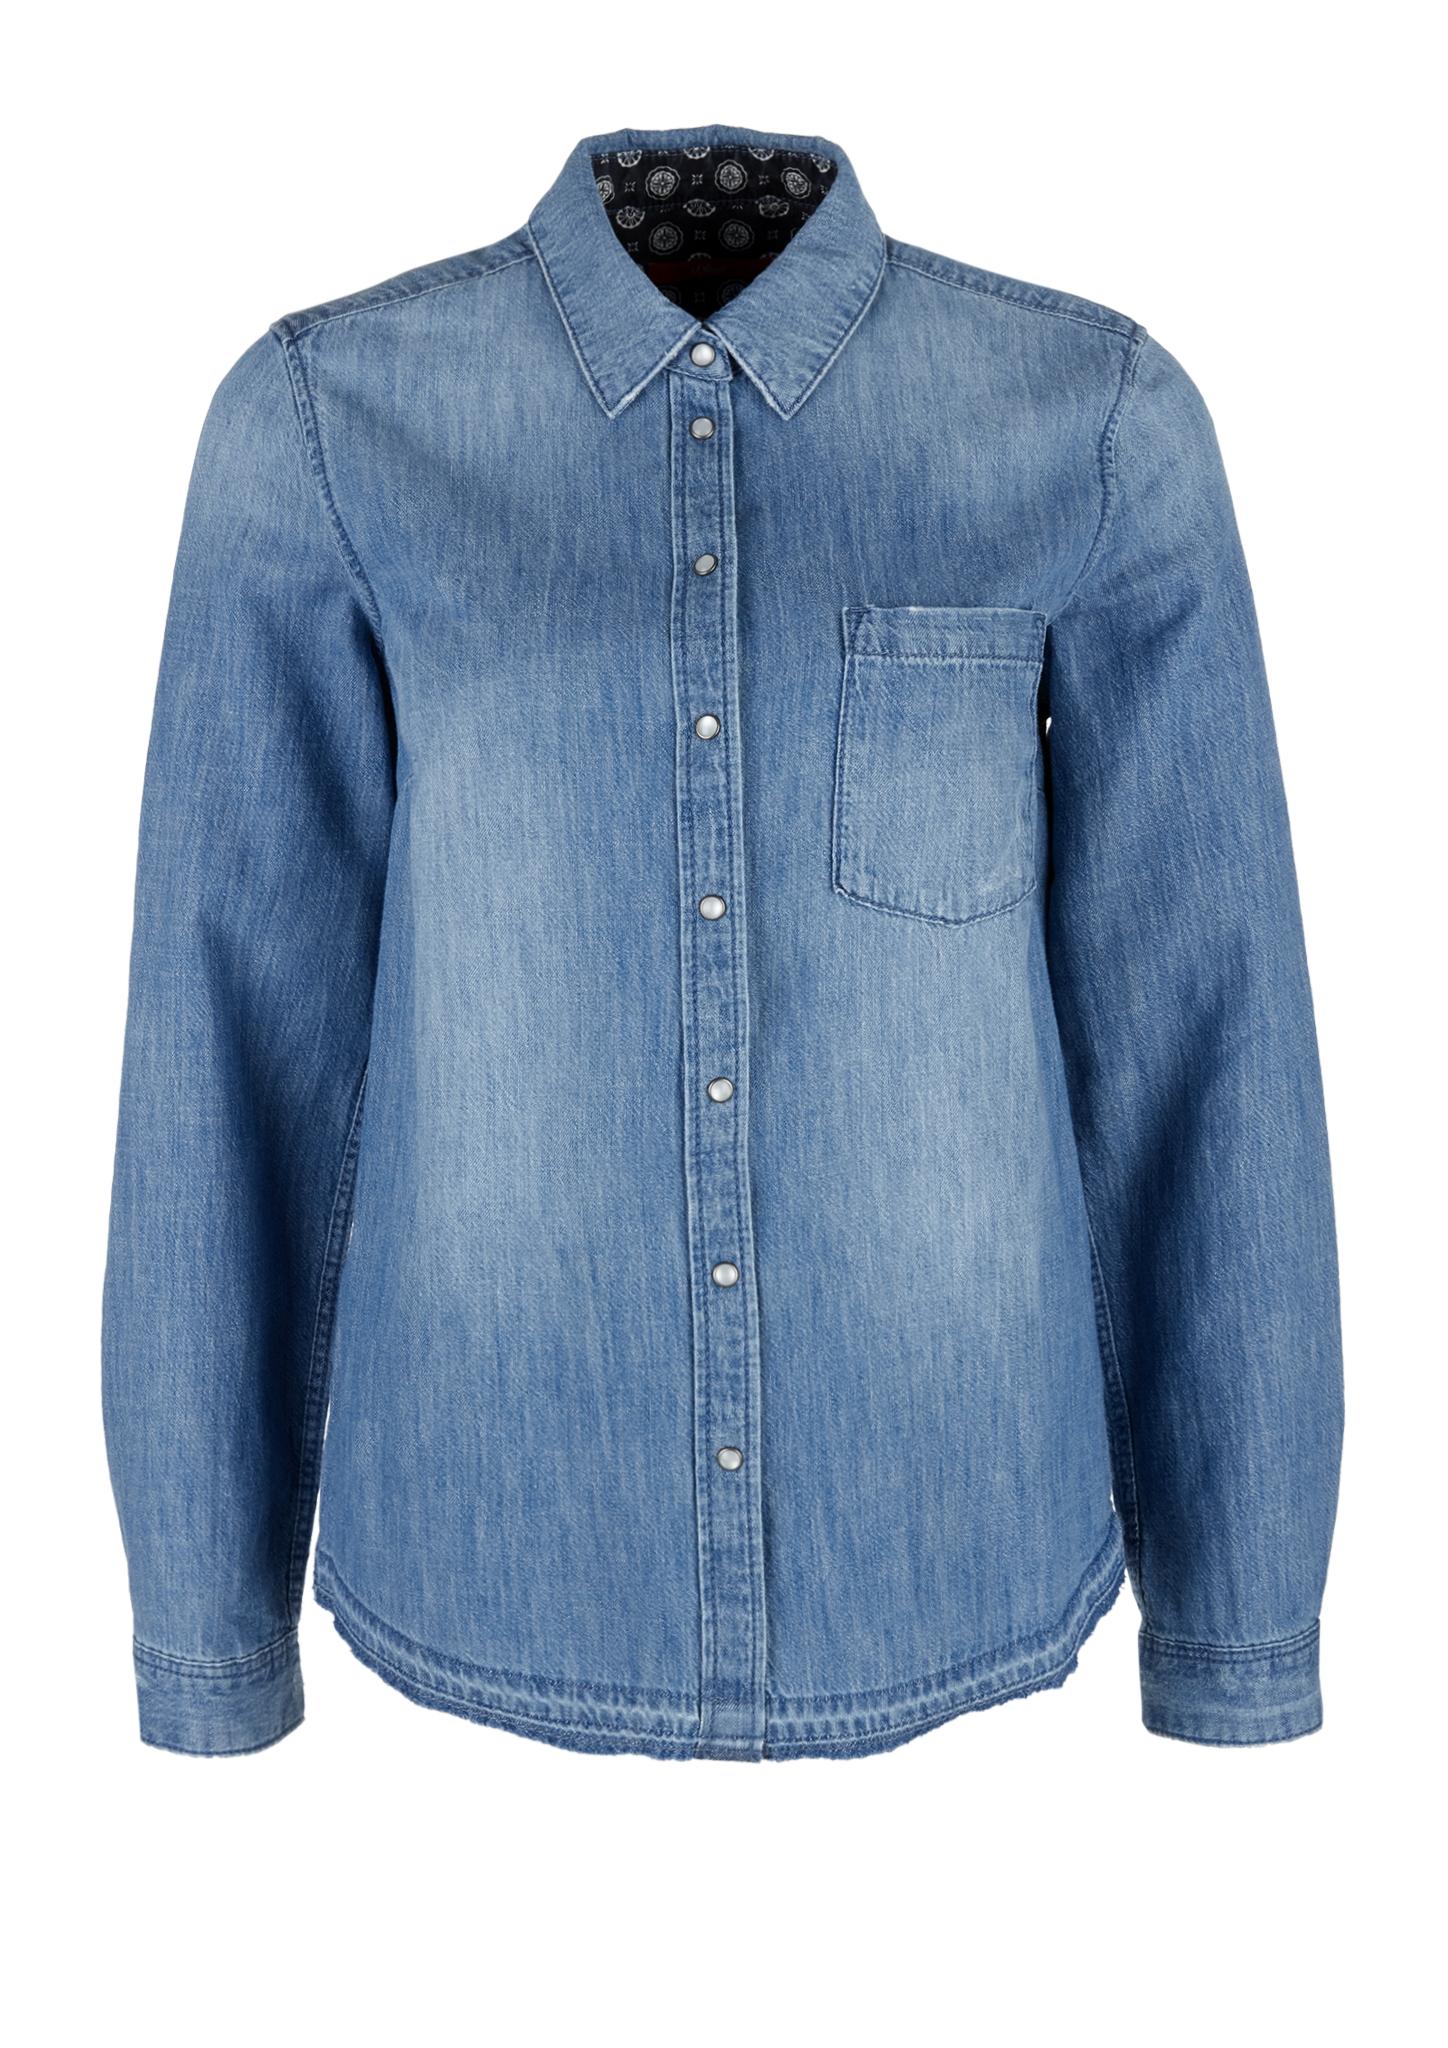 Jeansbluse   Bekleidung > Blusen > Jeansblusen   s.Oliver